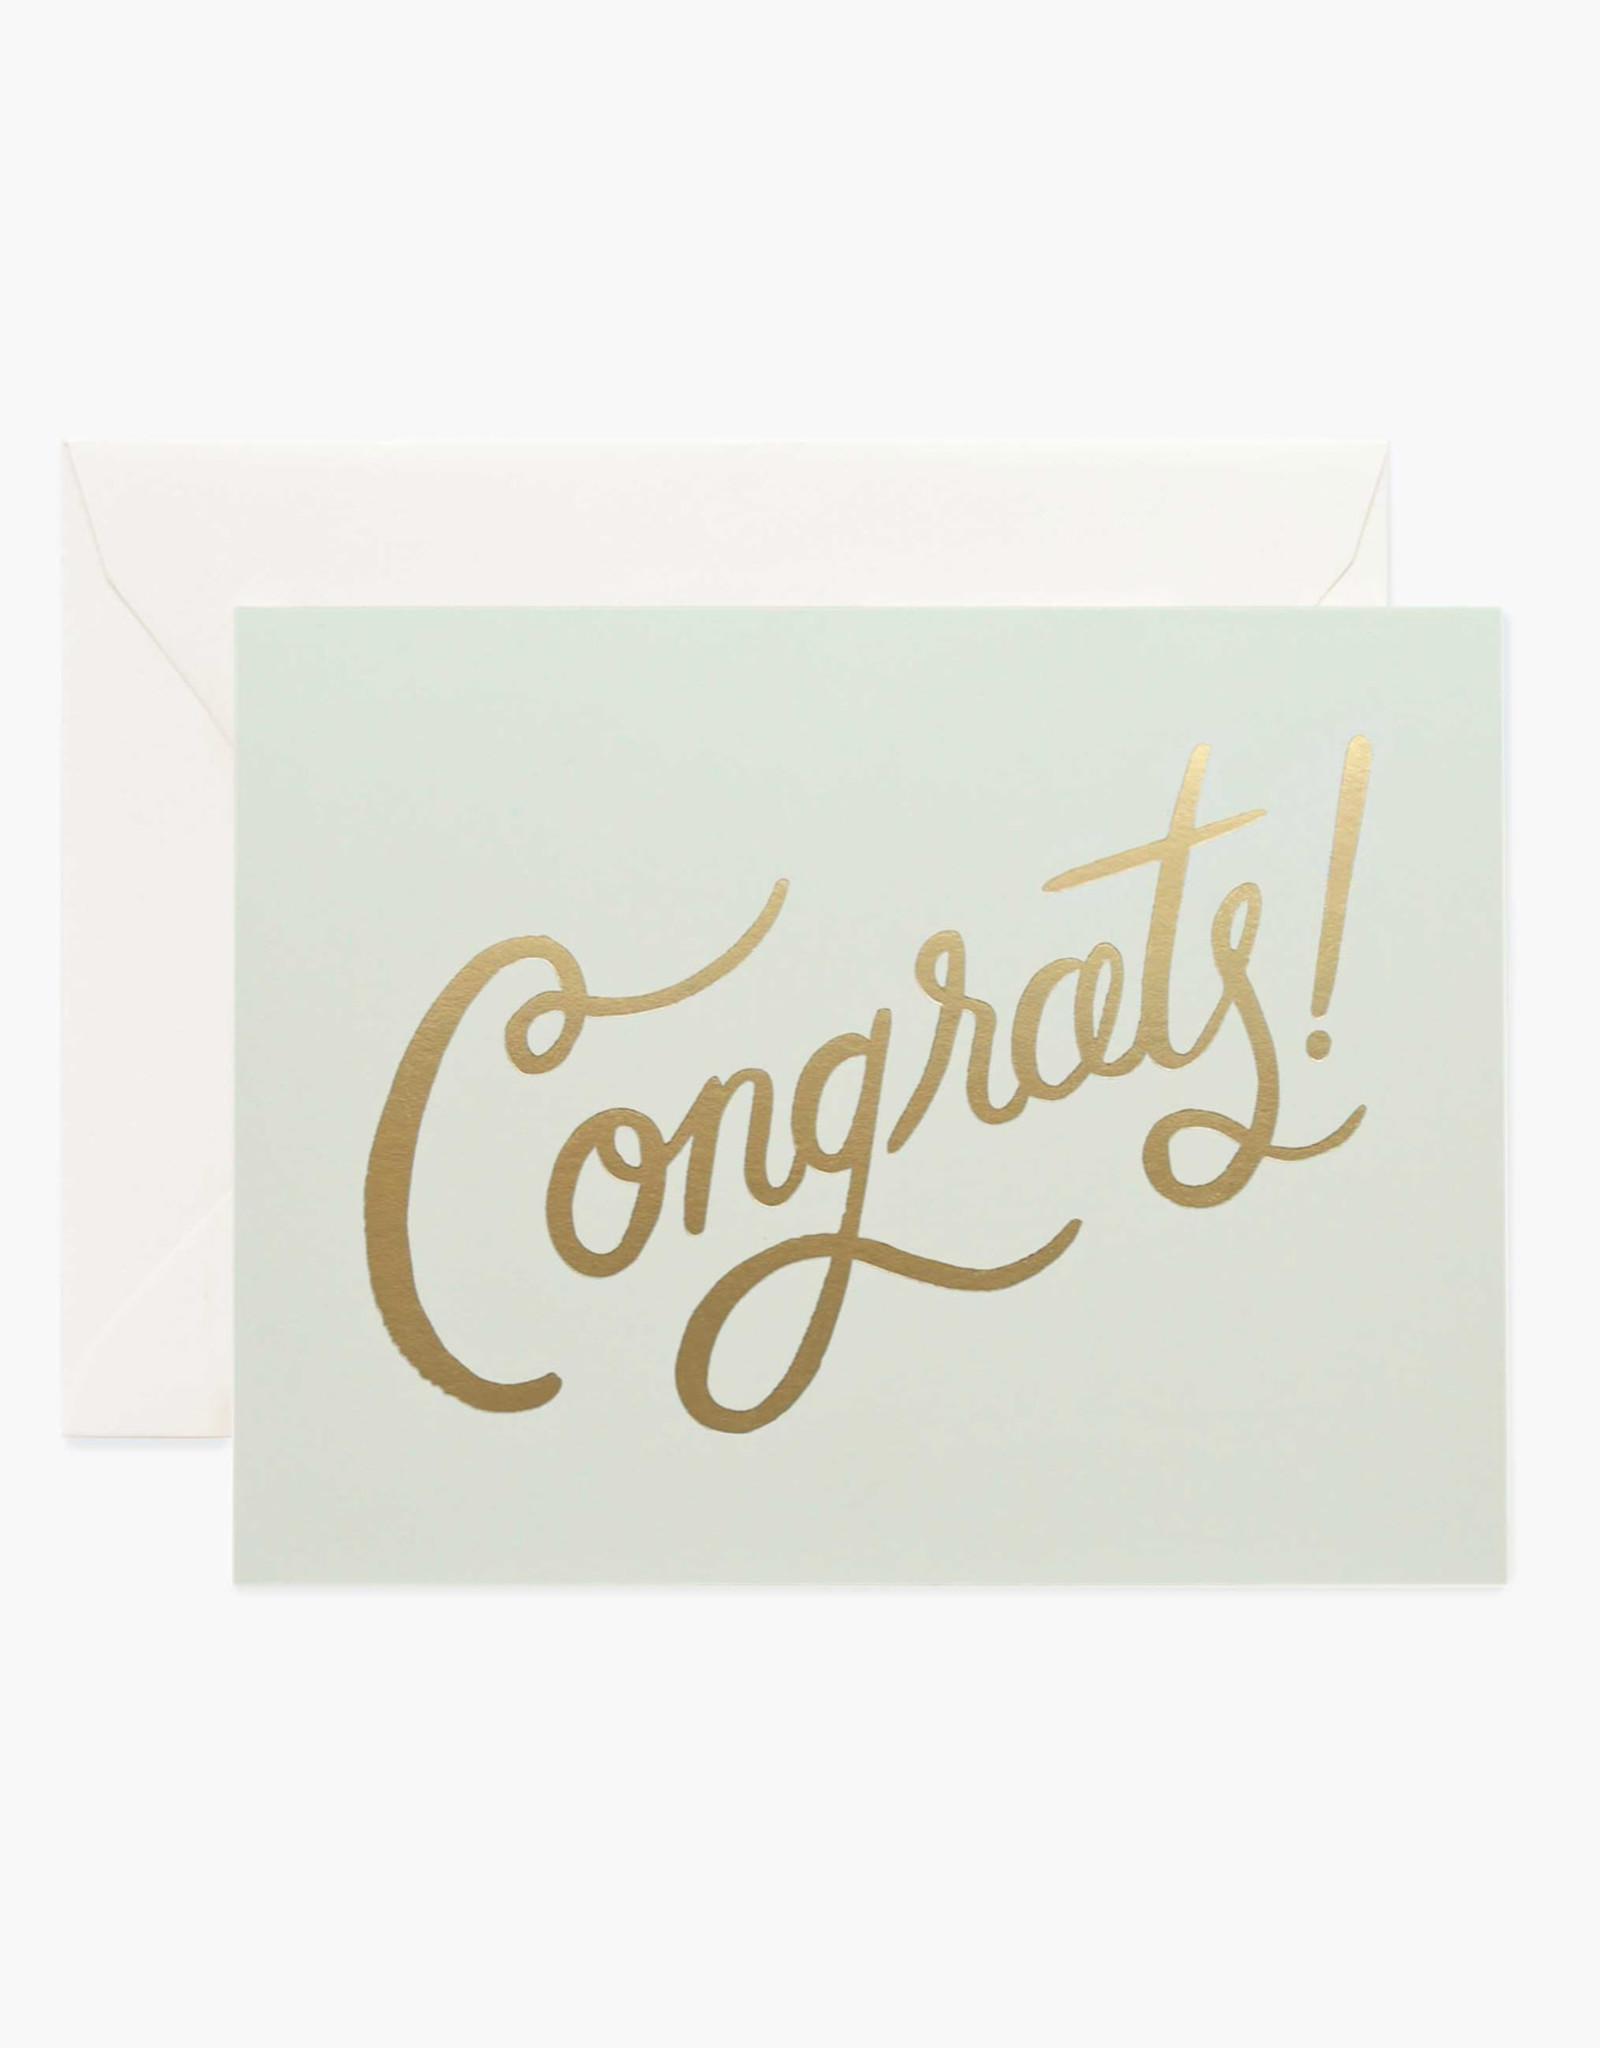 Timeless Congrats Card